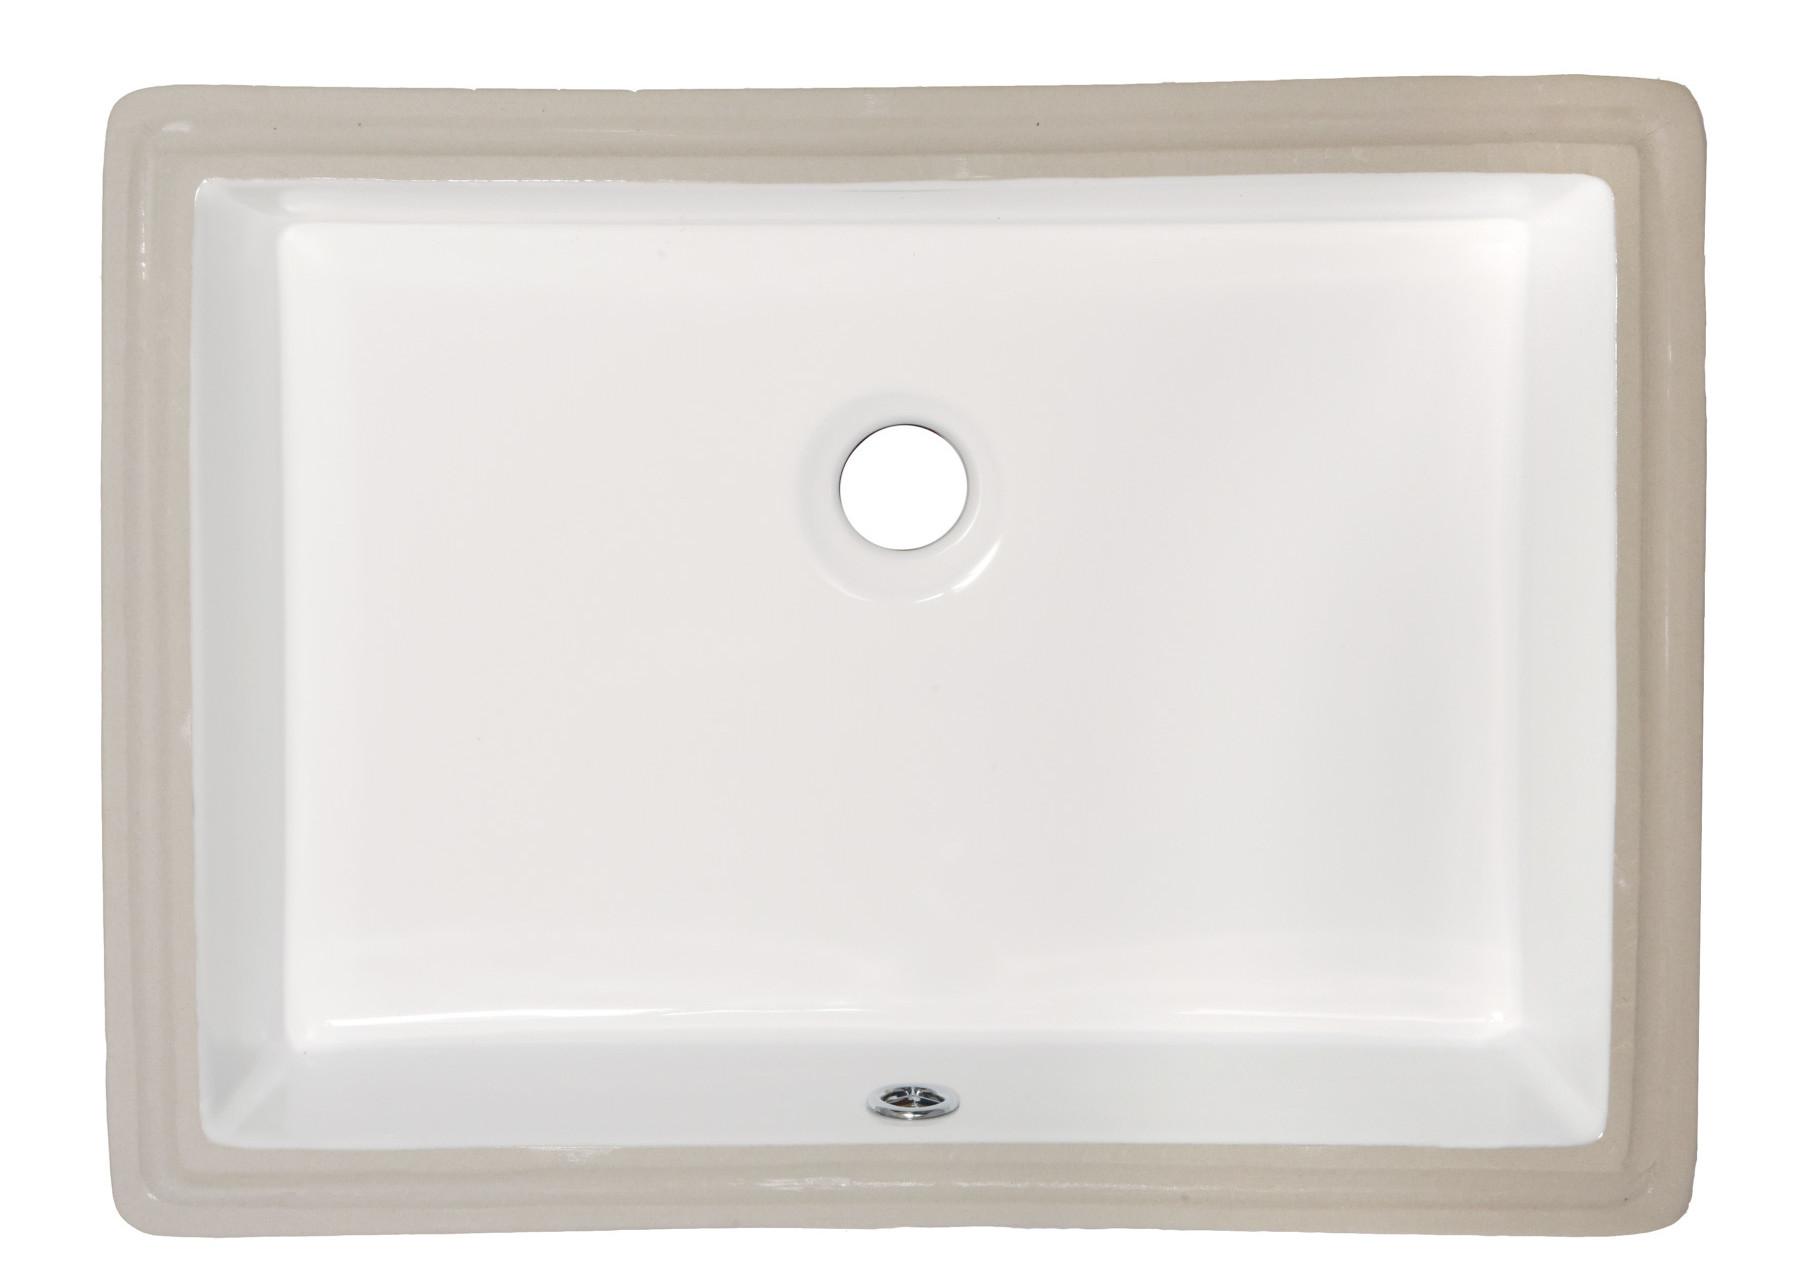 amerisink porcelain kitchen sink AS 19 75 14 38 5 75 Undermount Lavatory Porcelain Sink